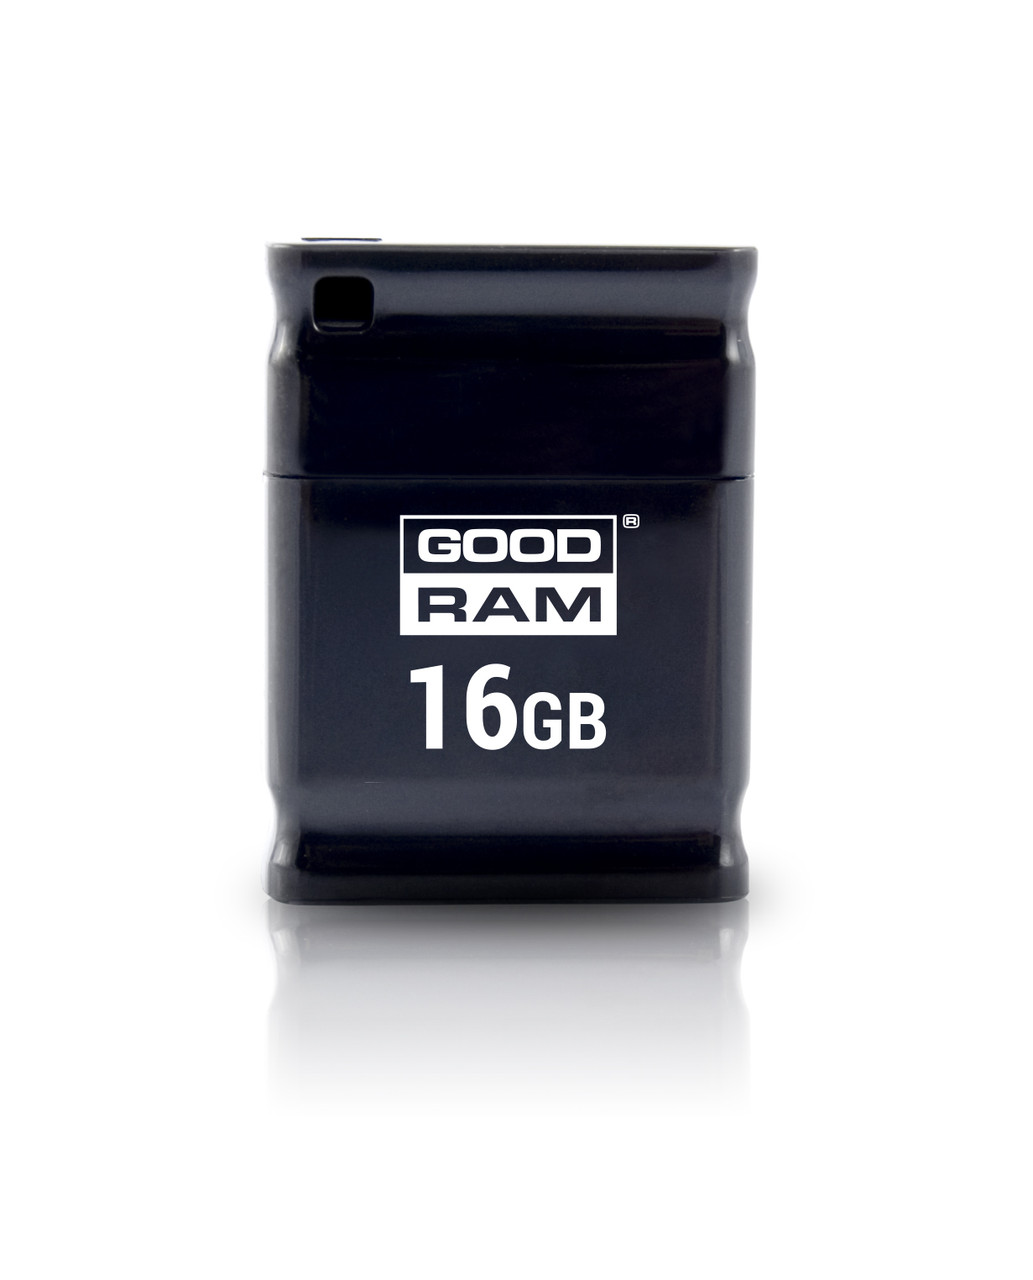 Флеш-накопичувач USB 16GB GOODRAM UPI2 (Piccolo) Black (UPI2-0160K0R11)